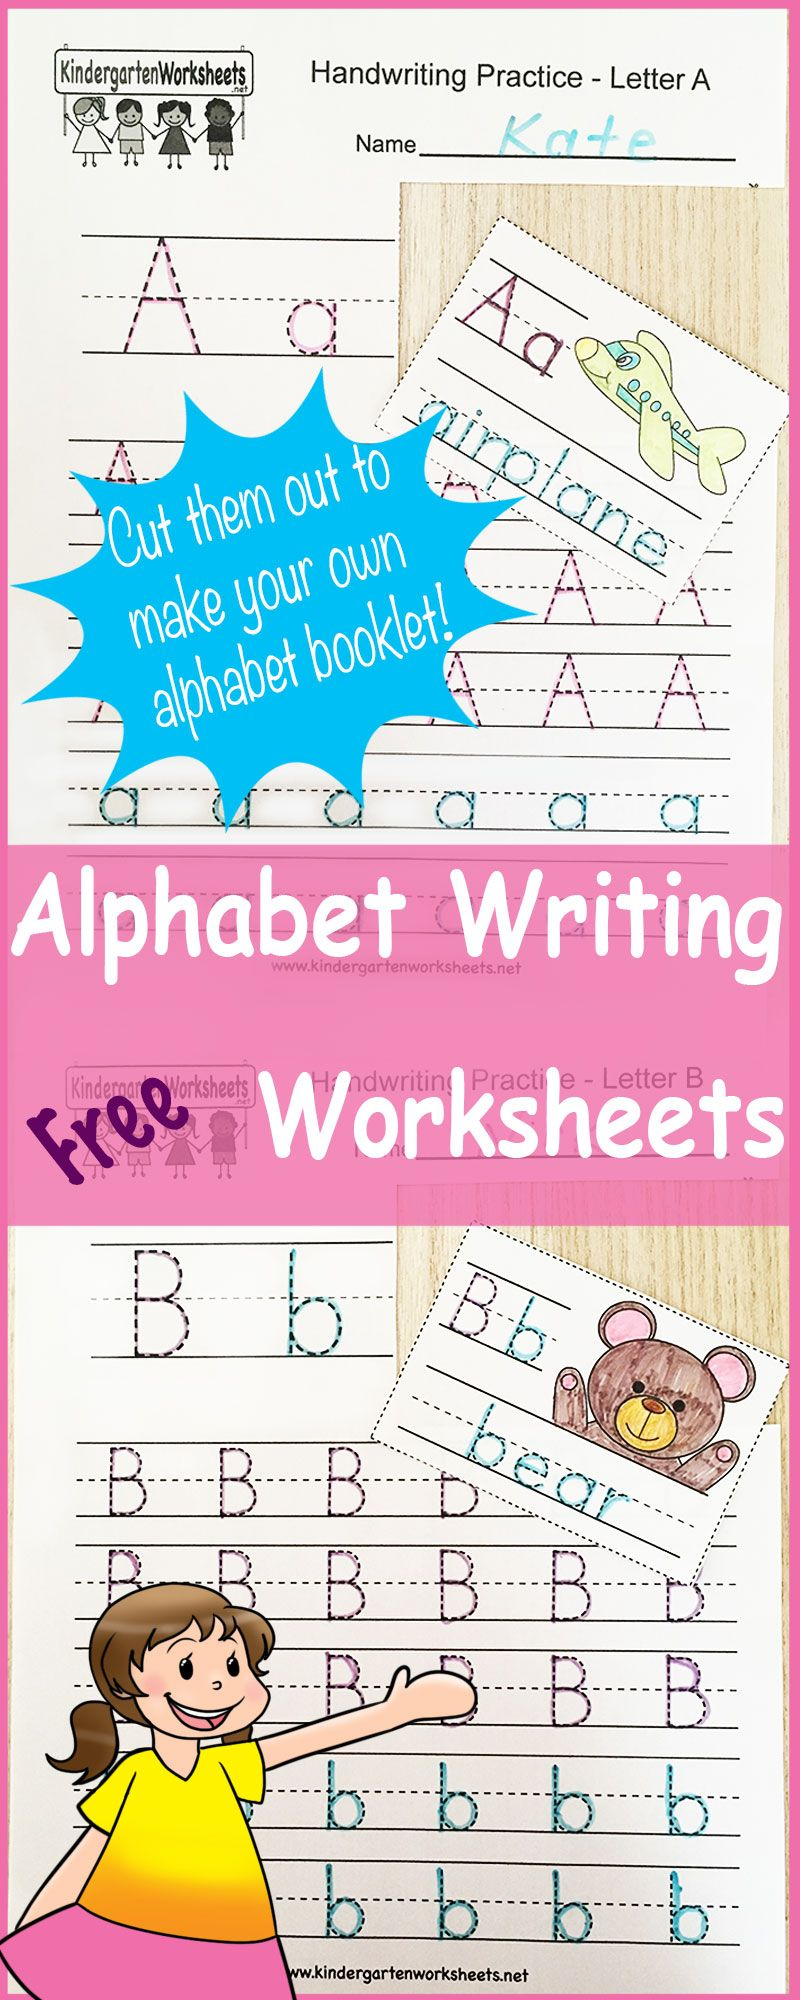 Handwriting Alphabet Worksheet. This series of handwriting alphabet ...